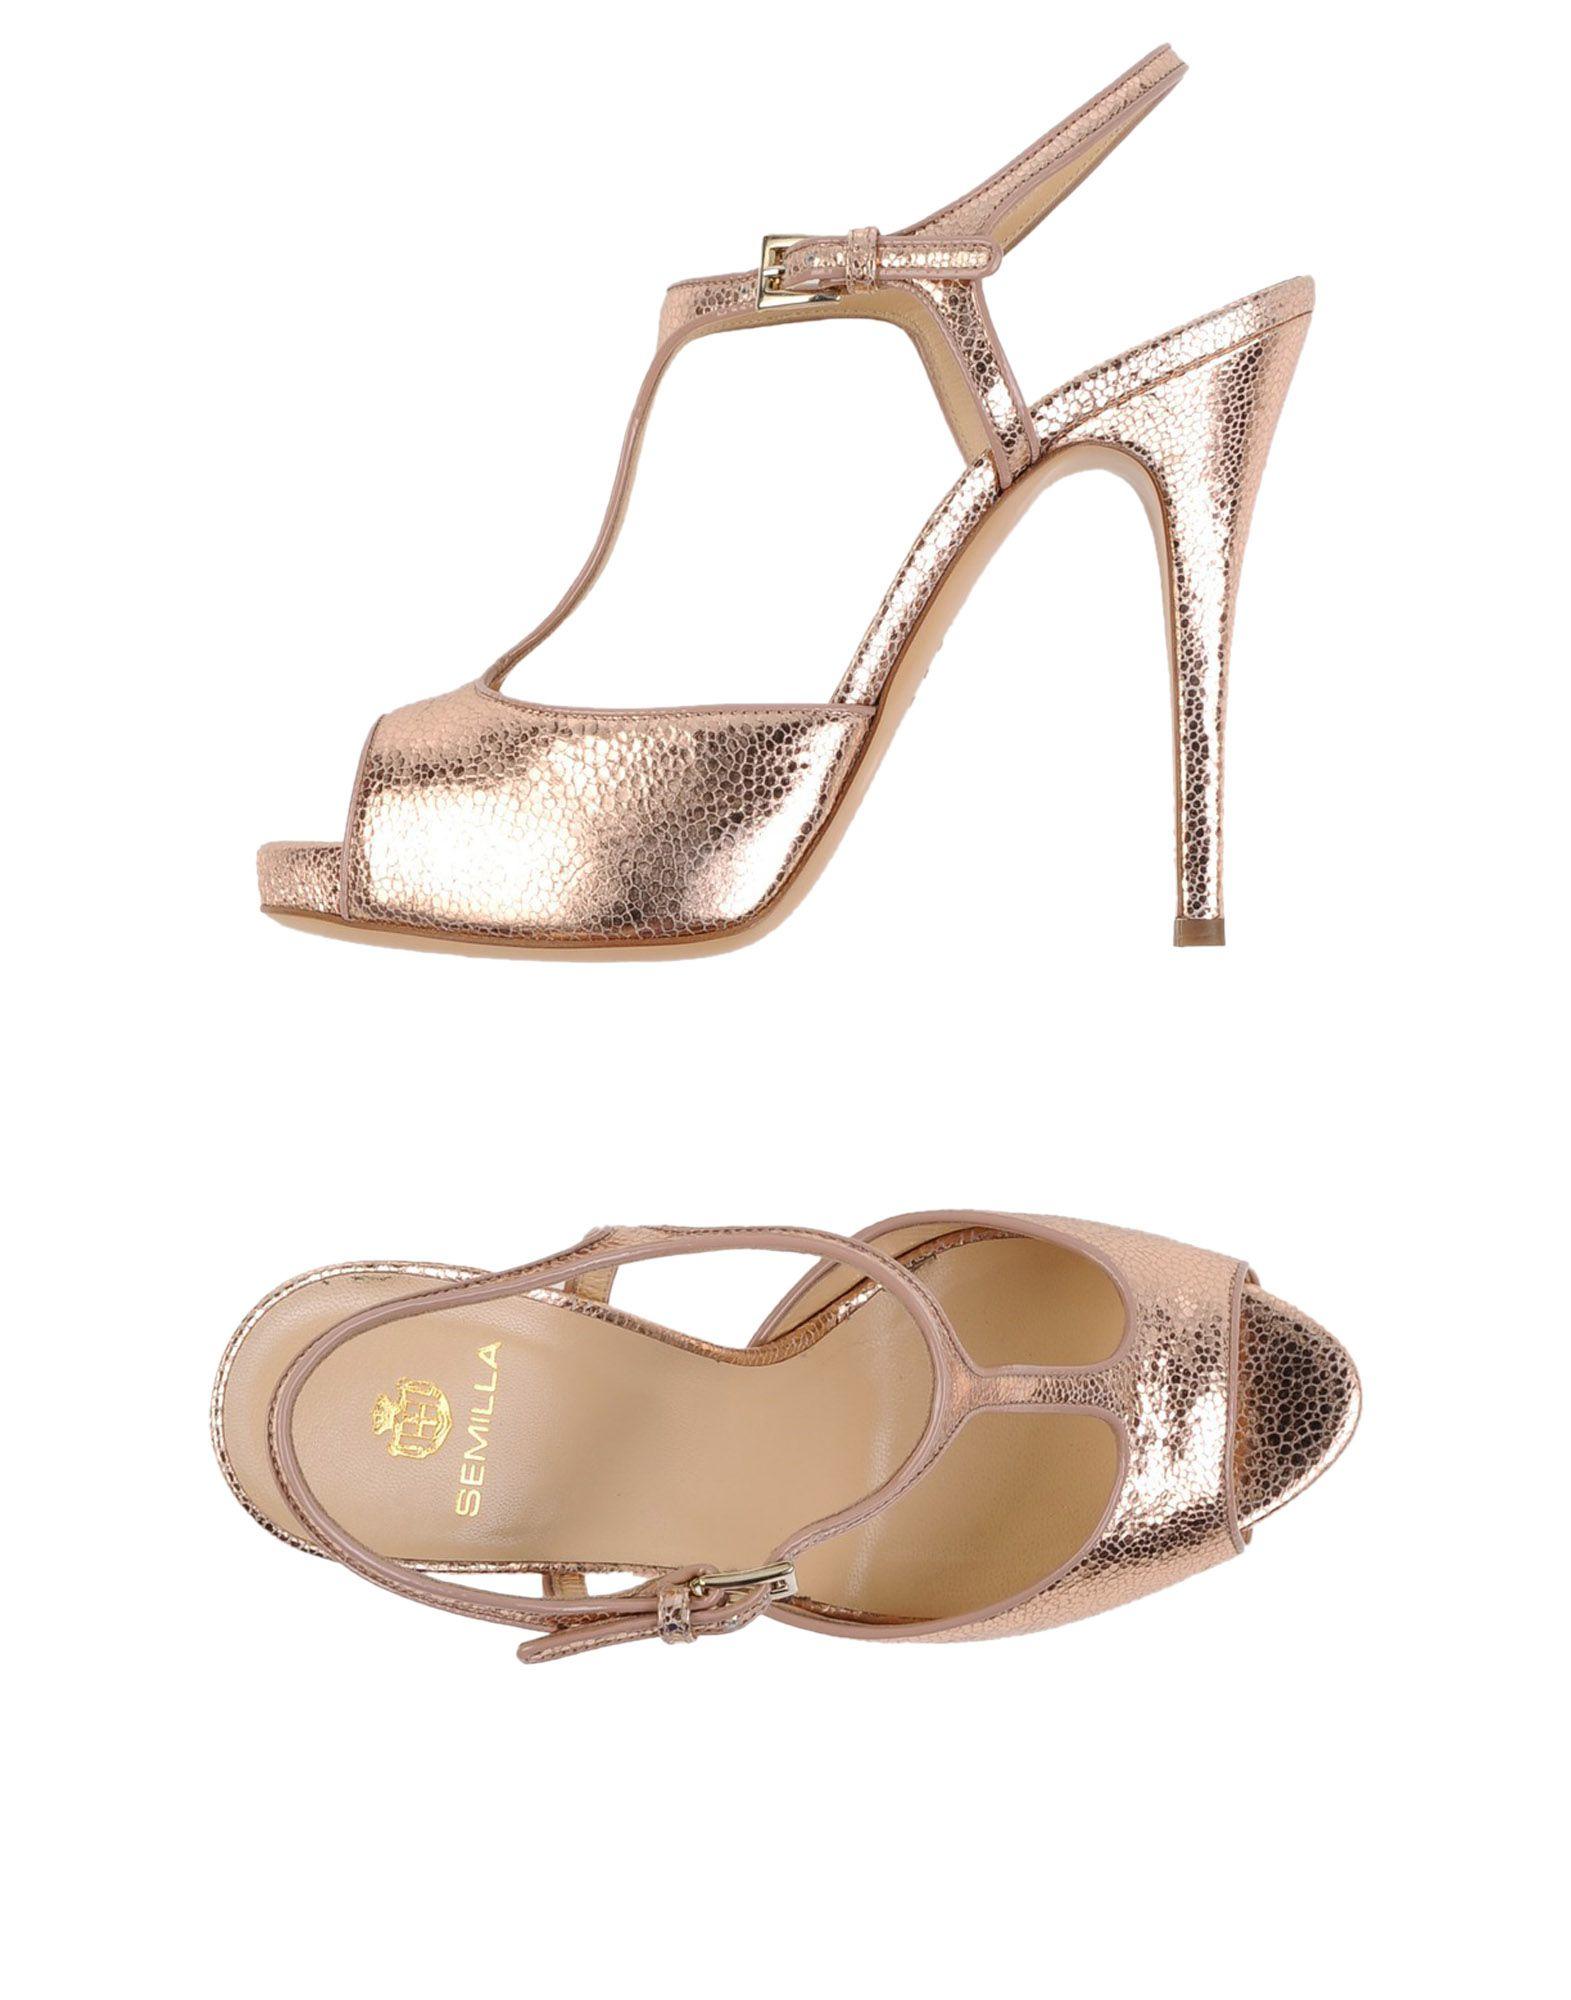 9b32e7dc5405 Semilla Sandals in Pink - Lyst